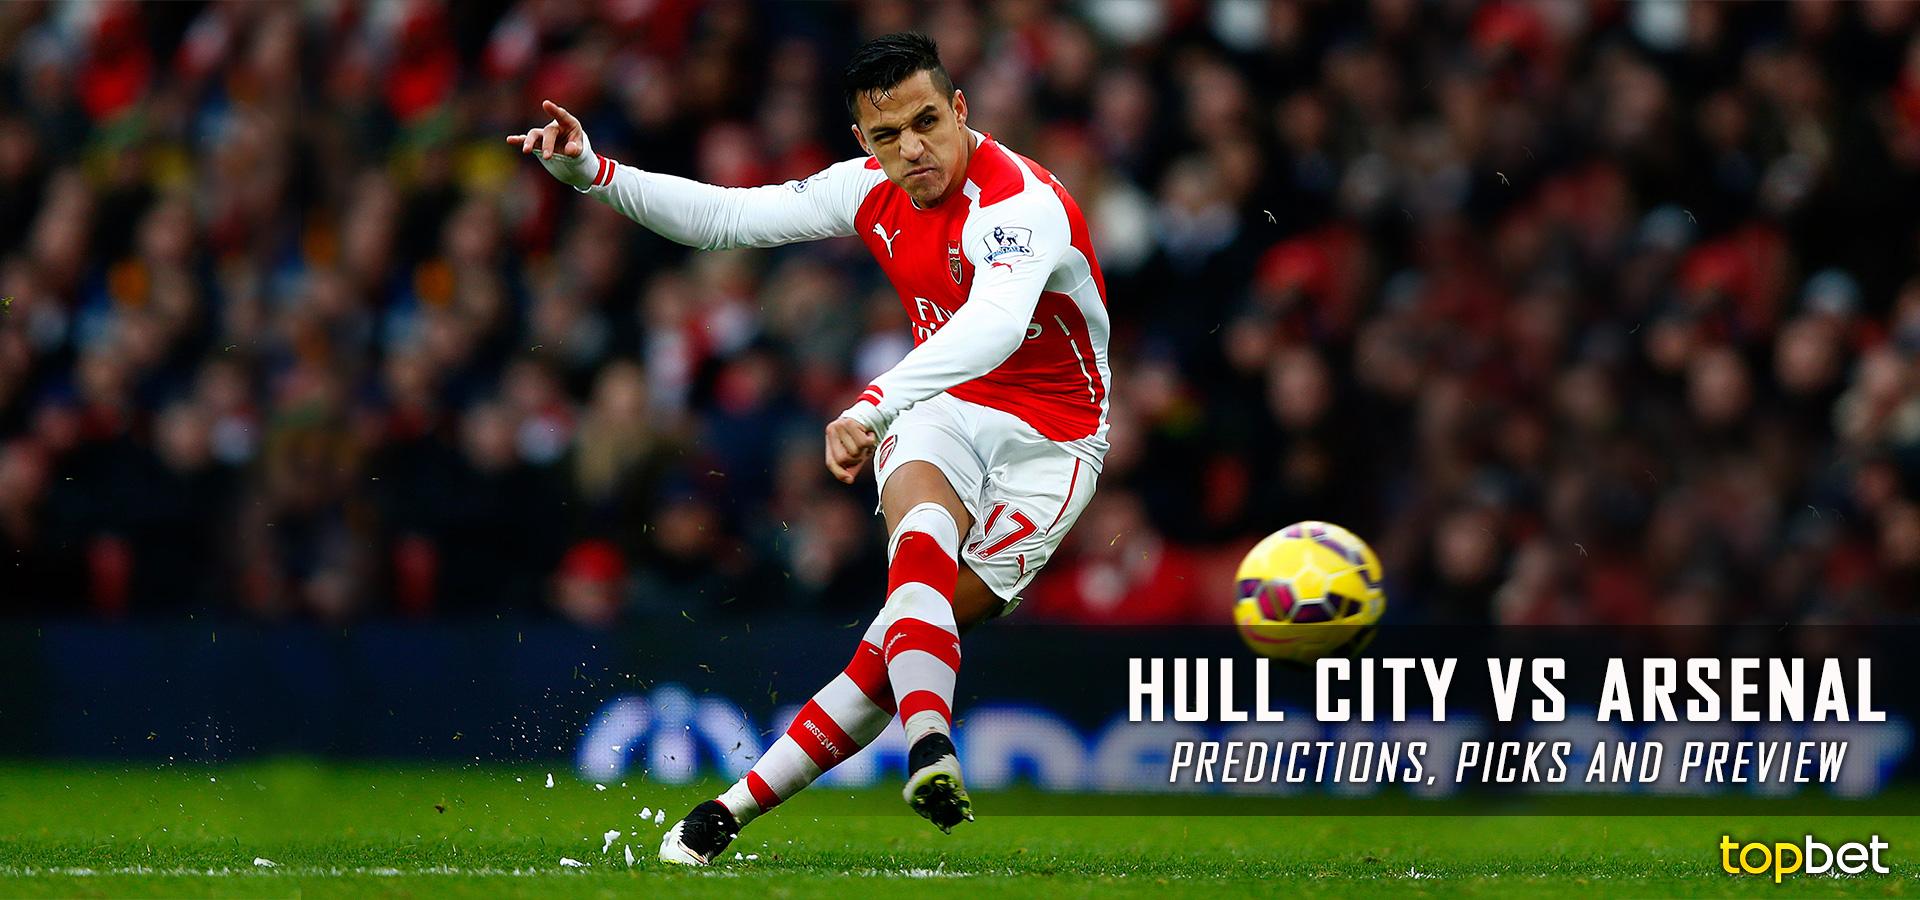 hull city vs